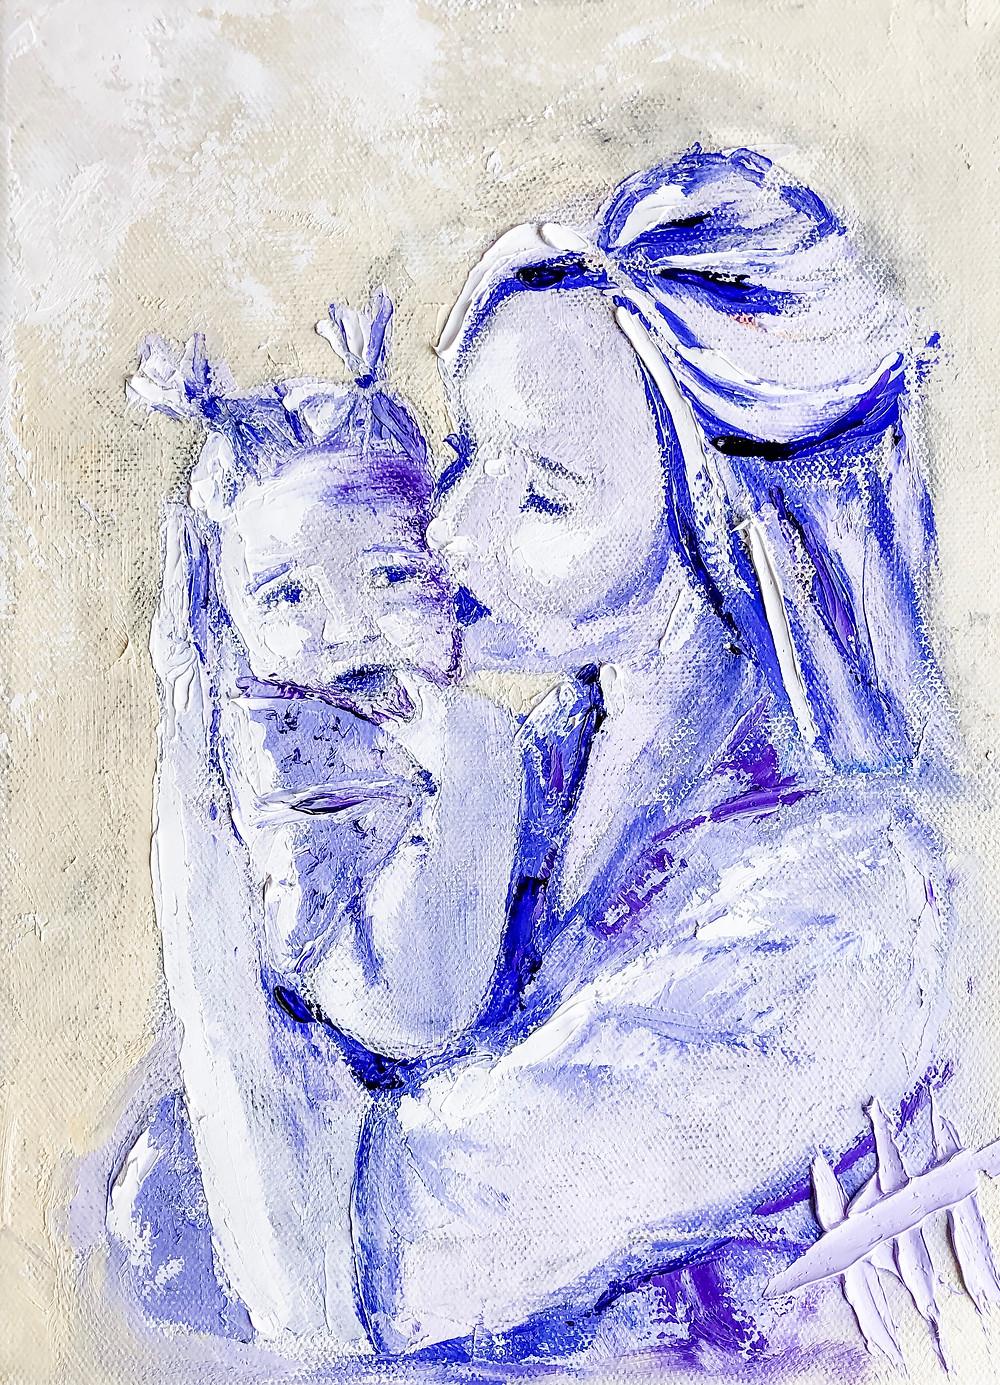 impressionist madonna and child by kentucky artist katie humphress